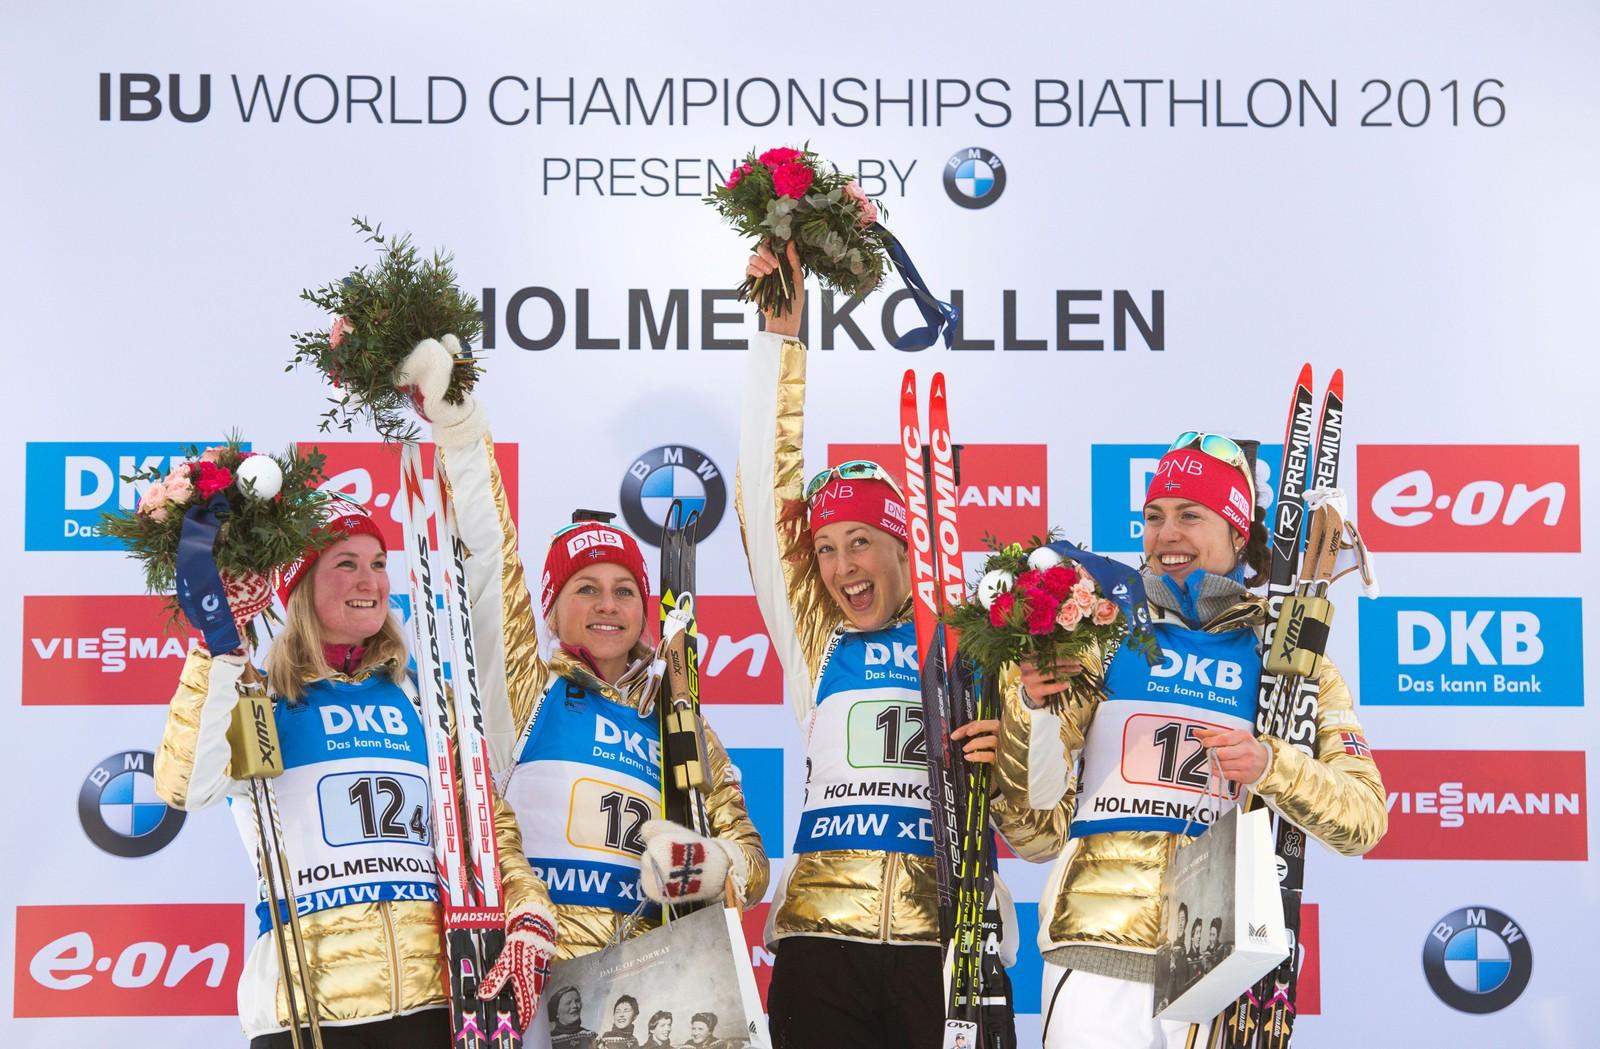 Stafett kvinner VM i skiskyting i Holmenkollen fredag. Fra v. Marte Olsbu, Tiril Eckhoff, Fanny Horn Birkeland og Synnøve Solemdal.